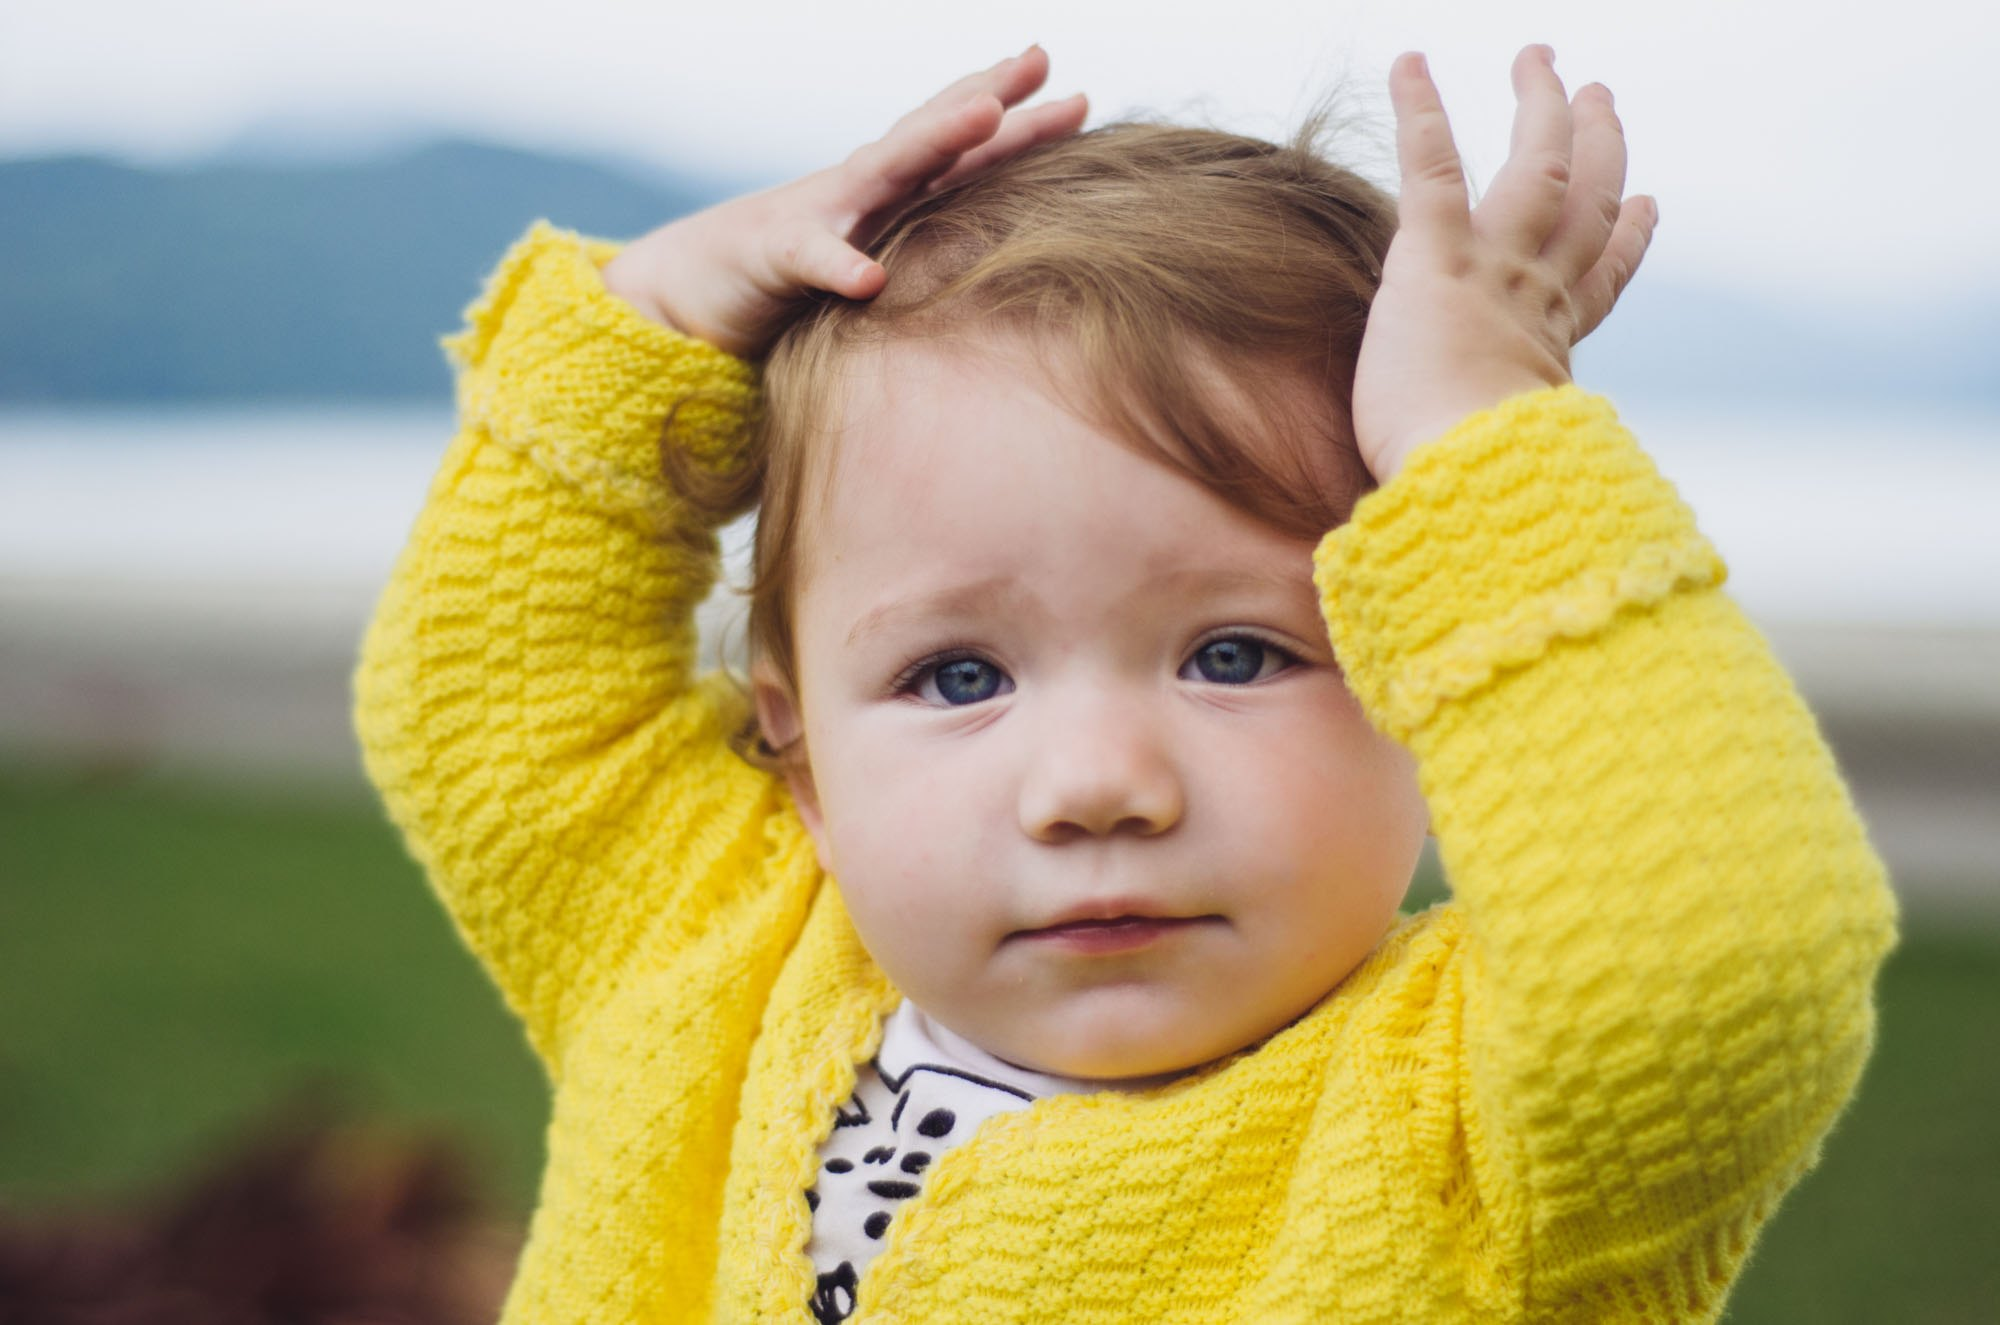 Maria-Eva-ensaio-infantil-ubatuba-sp-30-06-16-132